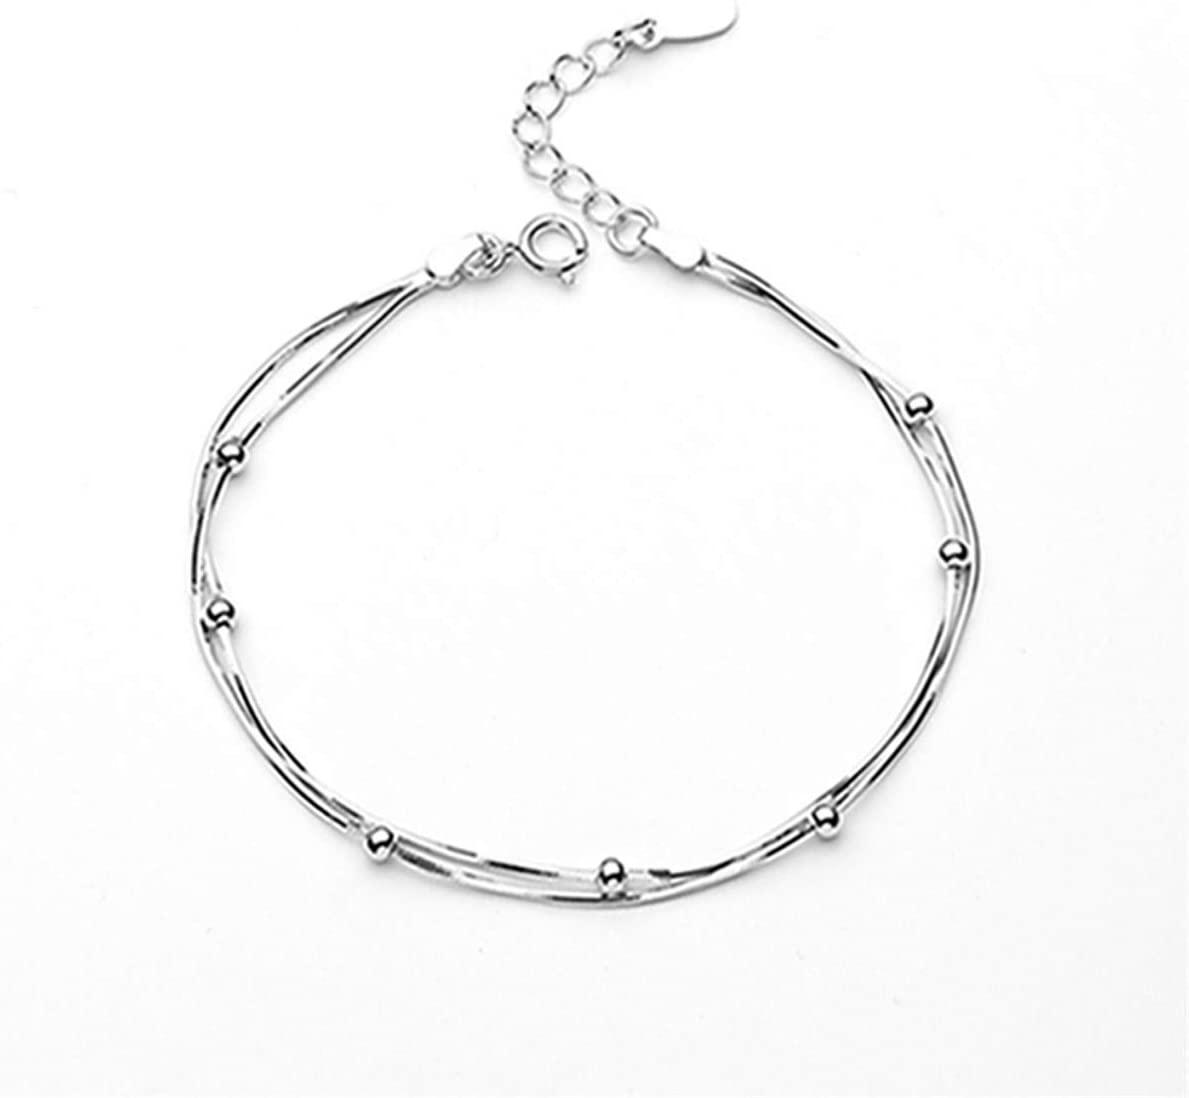 Beiswe Adjustable Silver Plated Bracelet Layered Beads Tassel Anklet for Women Girls Wedding